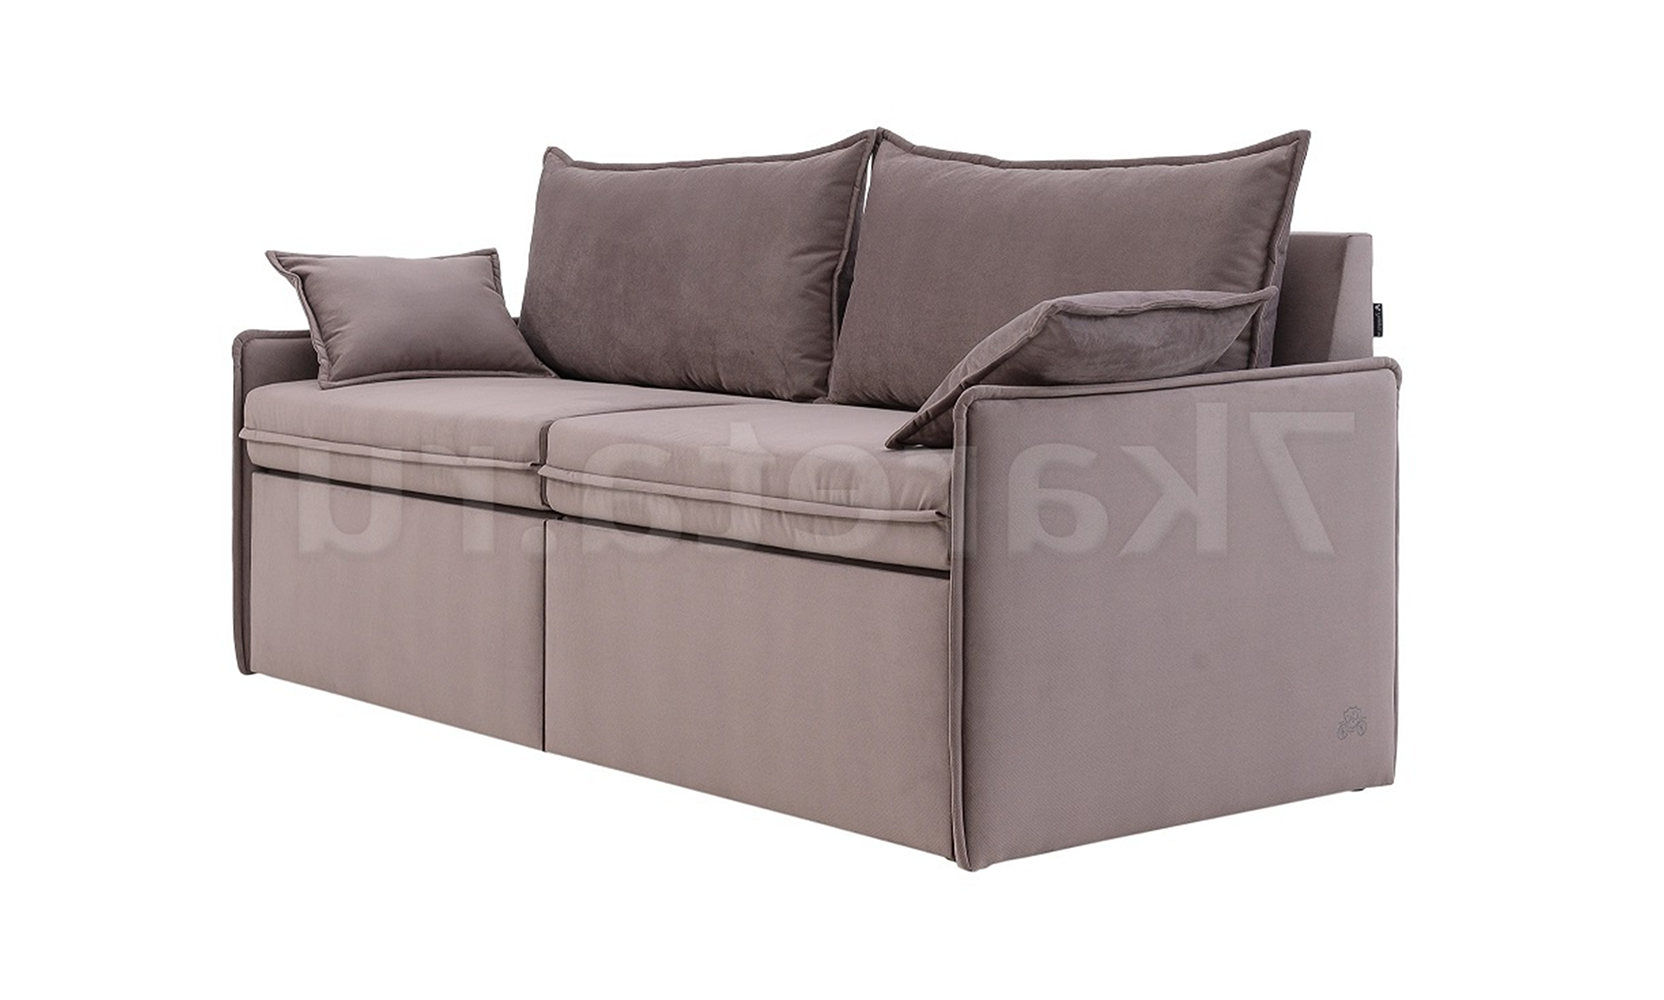 7 Карета выкатной диван Сен-Клер